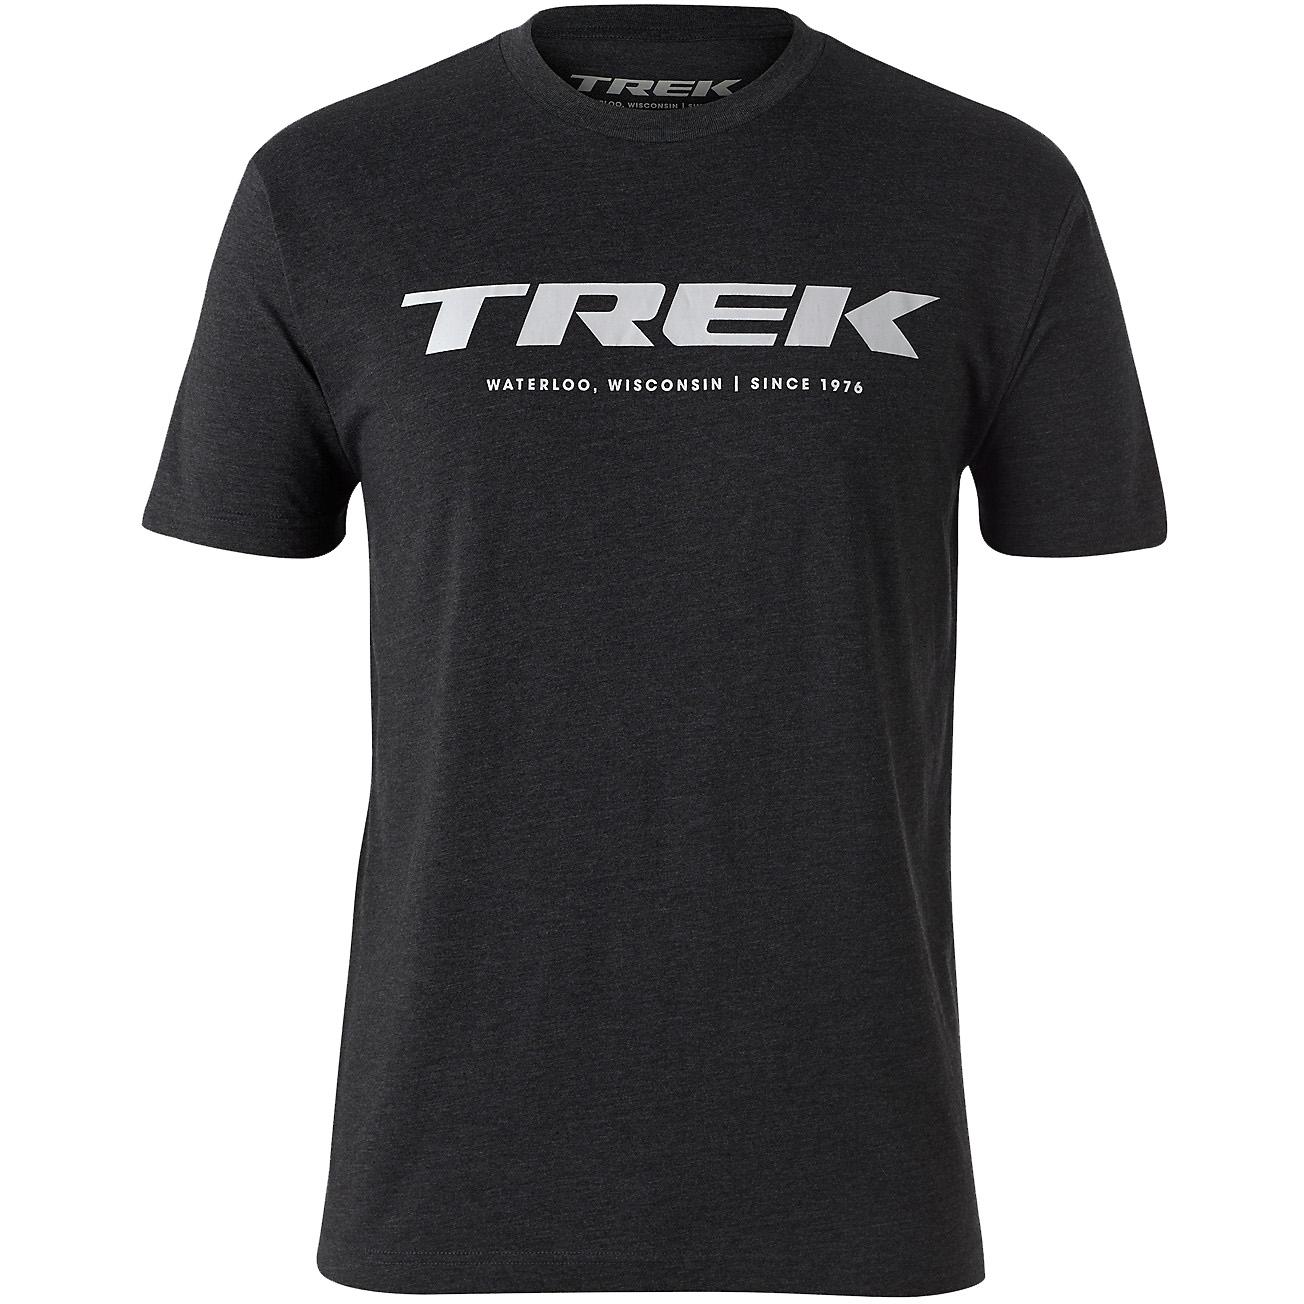 Trek Origin T-Shirt Unisex - Black